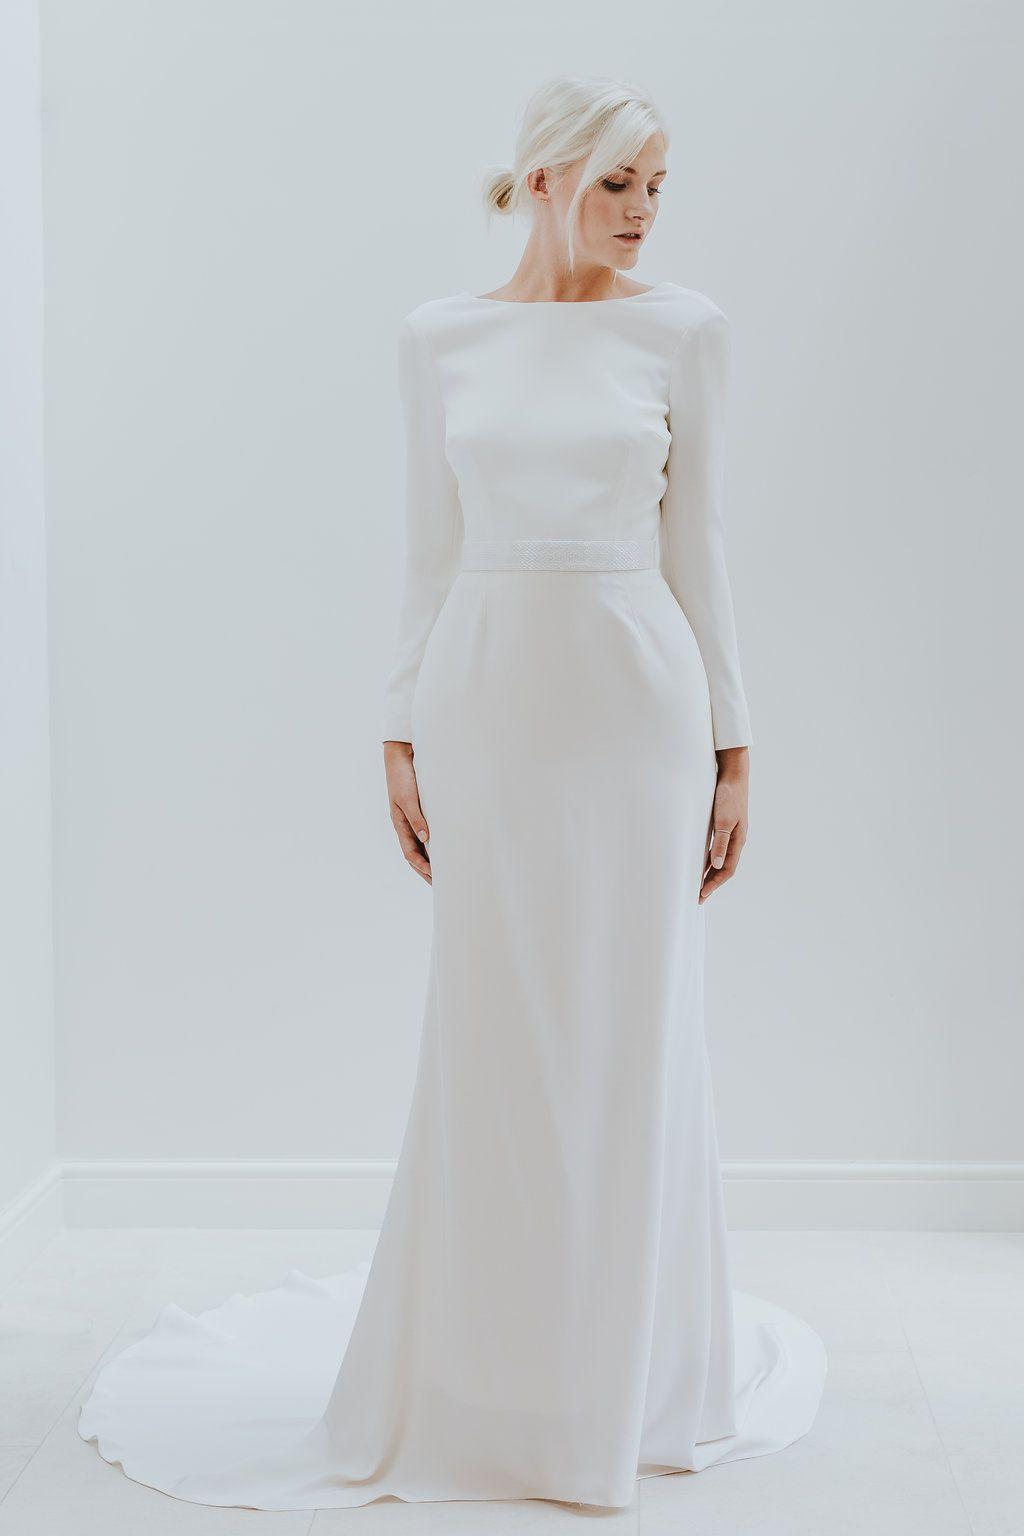 Designer Trouwjurk.Minimalist Elegance Met Charlotte Simpson Bridal Trouwjurk Modern